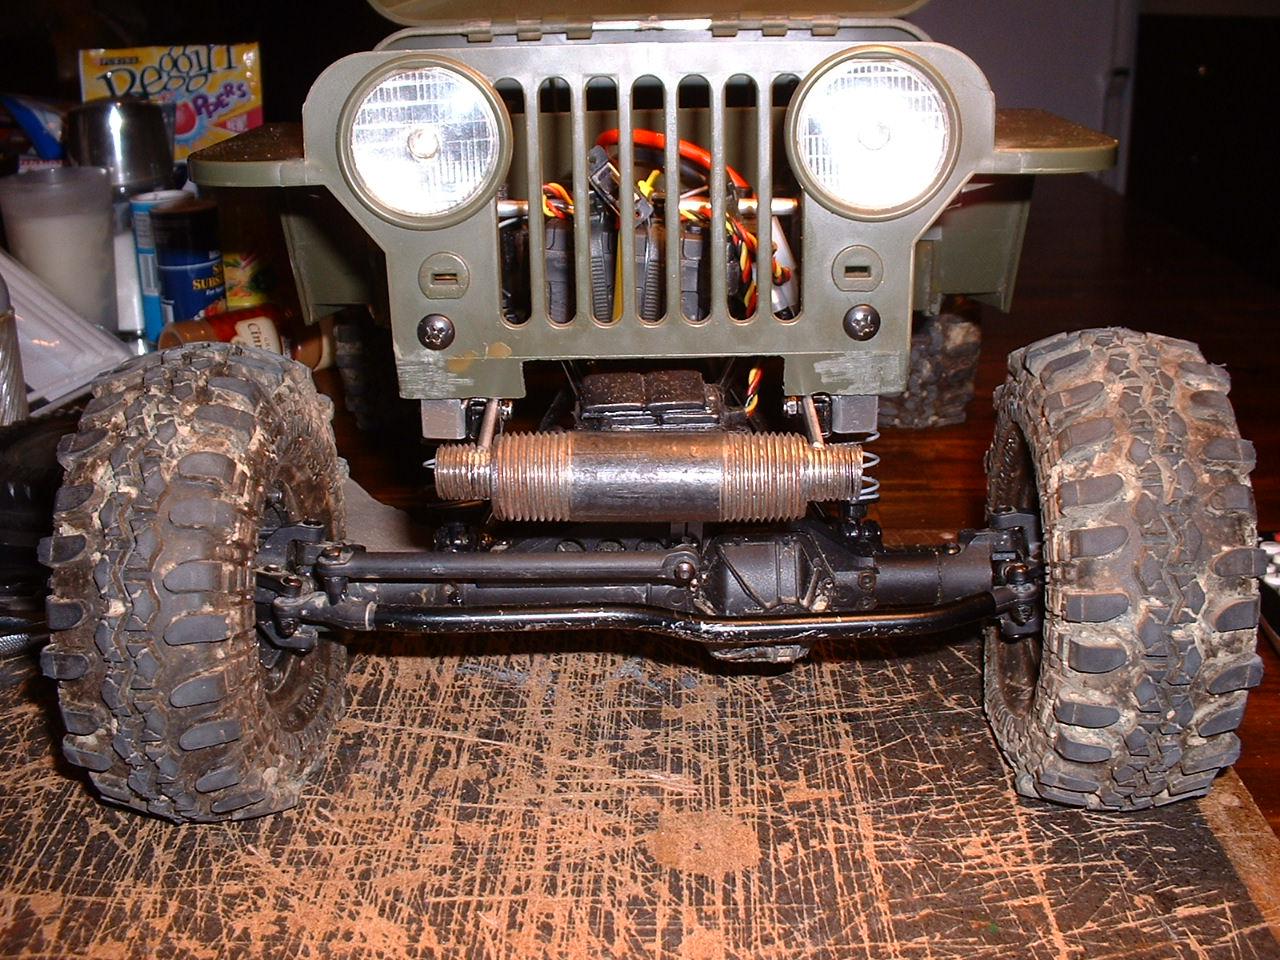 Click image for larger version  Name:G.I. Joe Jeep 6 002.JPG Views:717 Size:335.5 KB ID:2051073